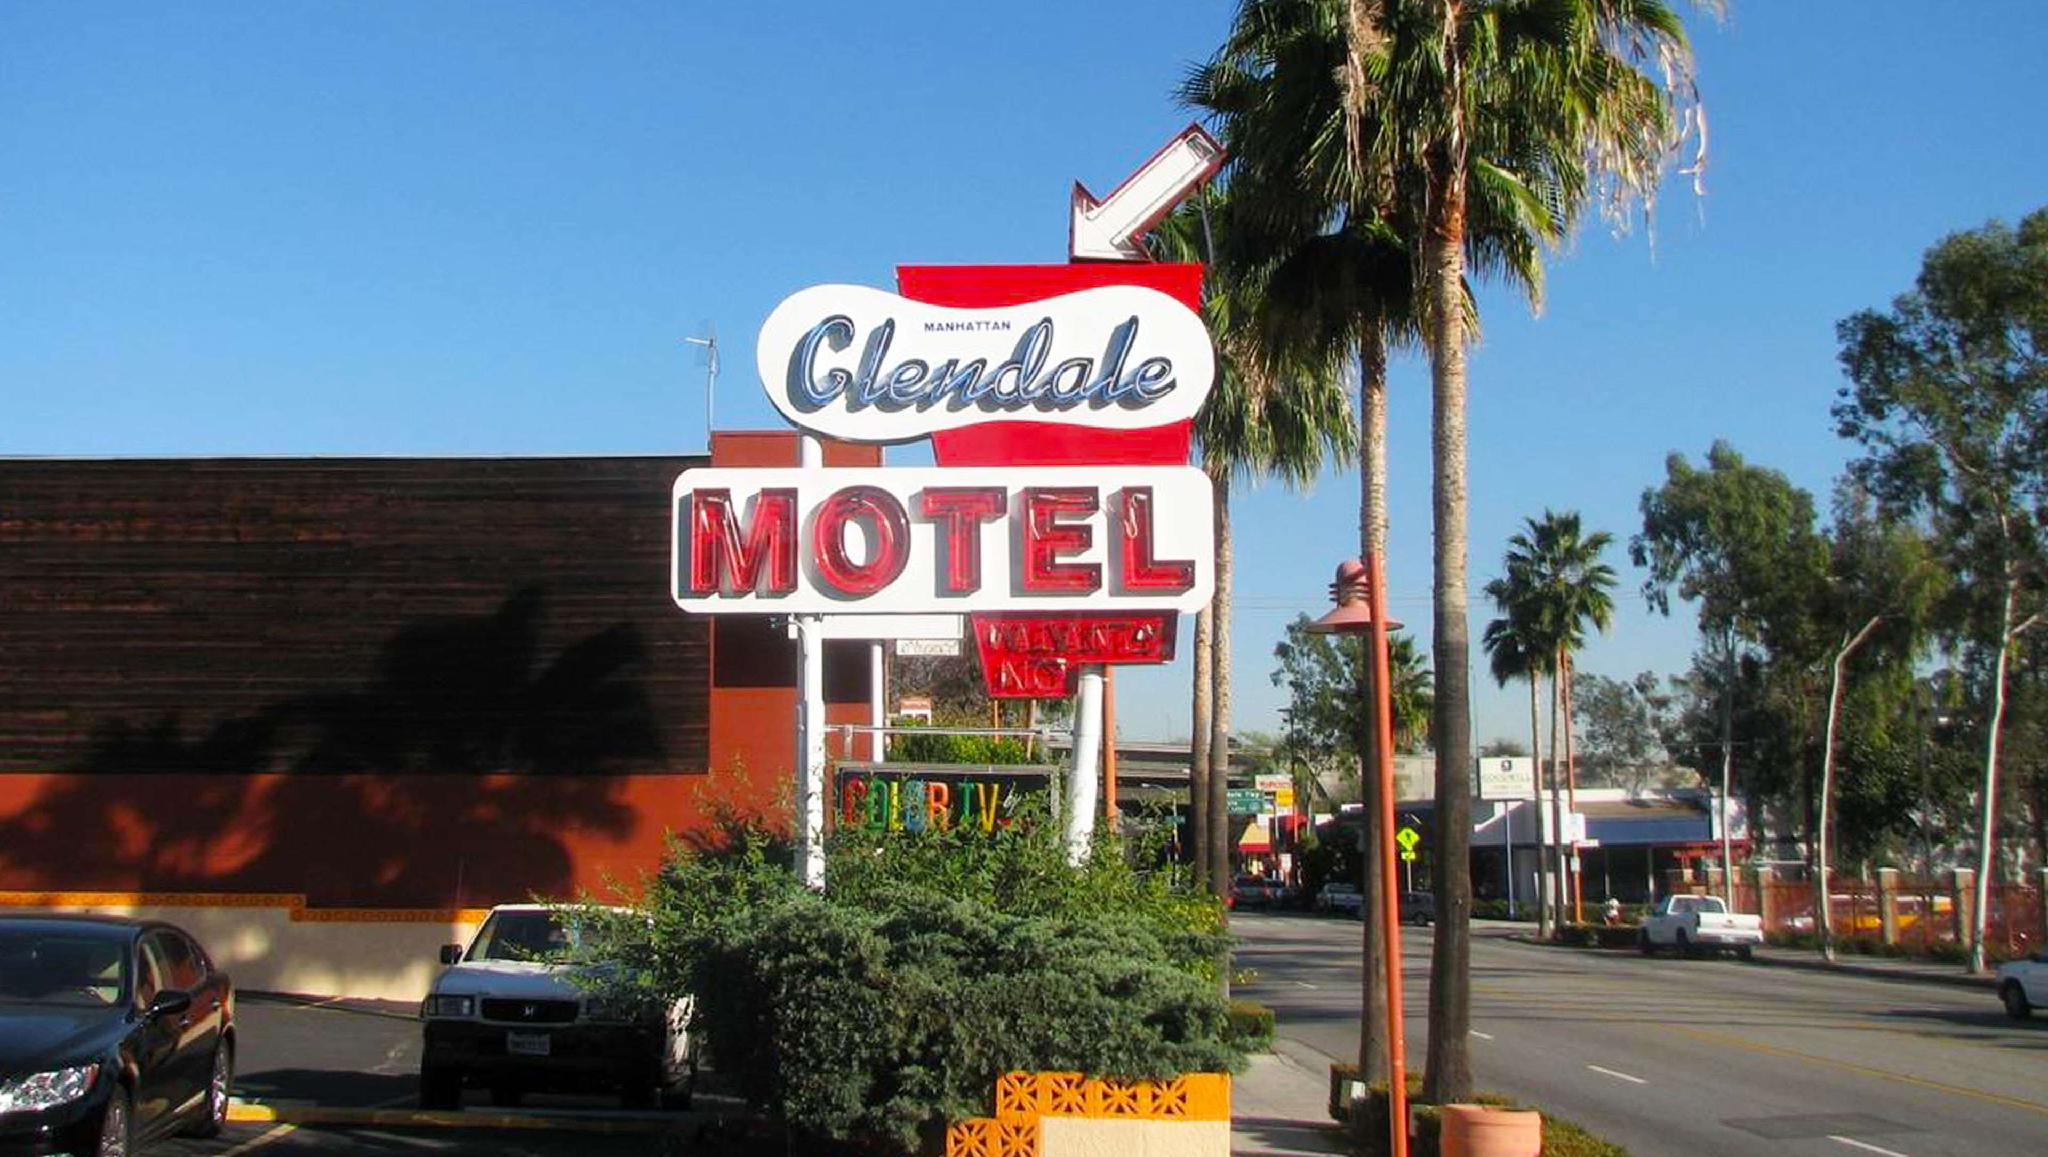 Glendale Manhattan Motel By Magnuson Worldwide